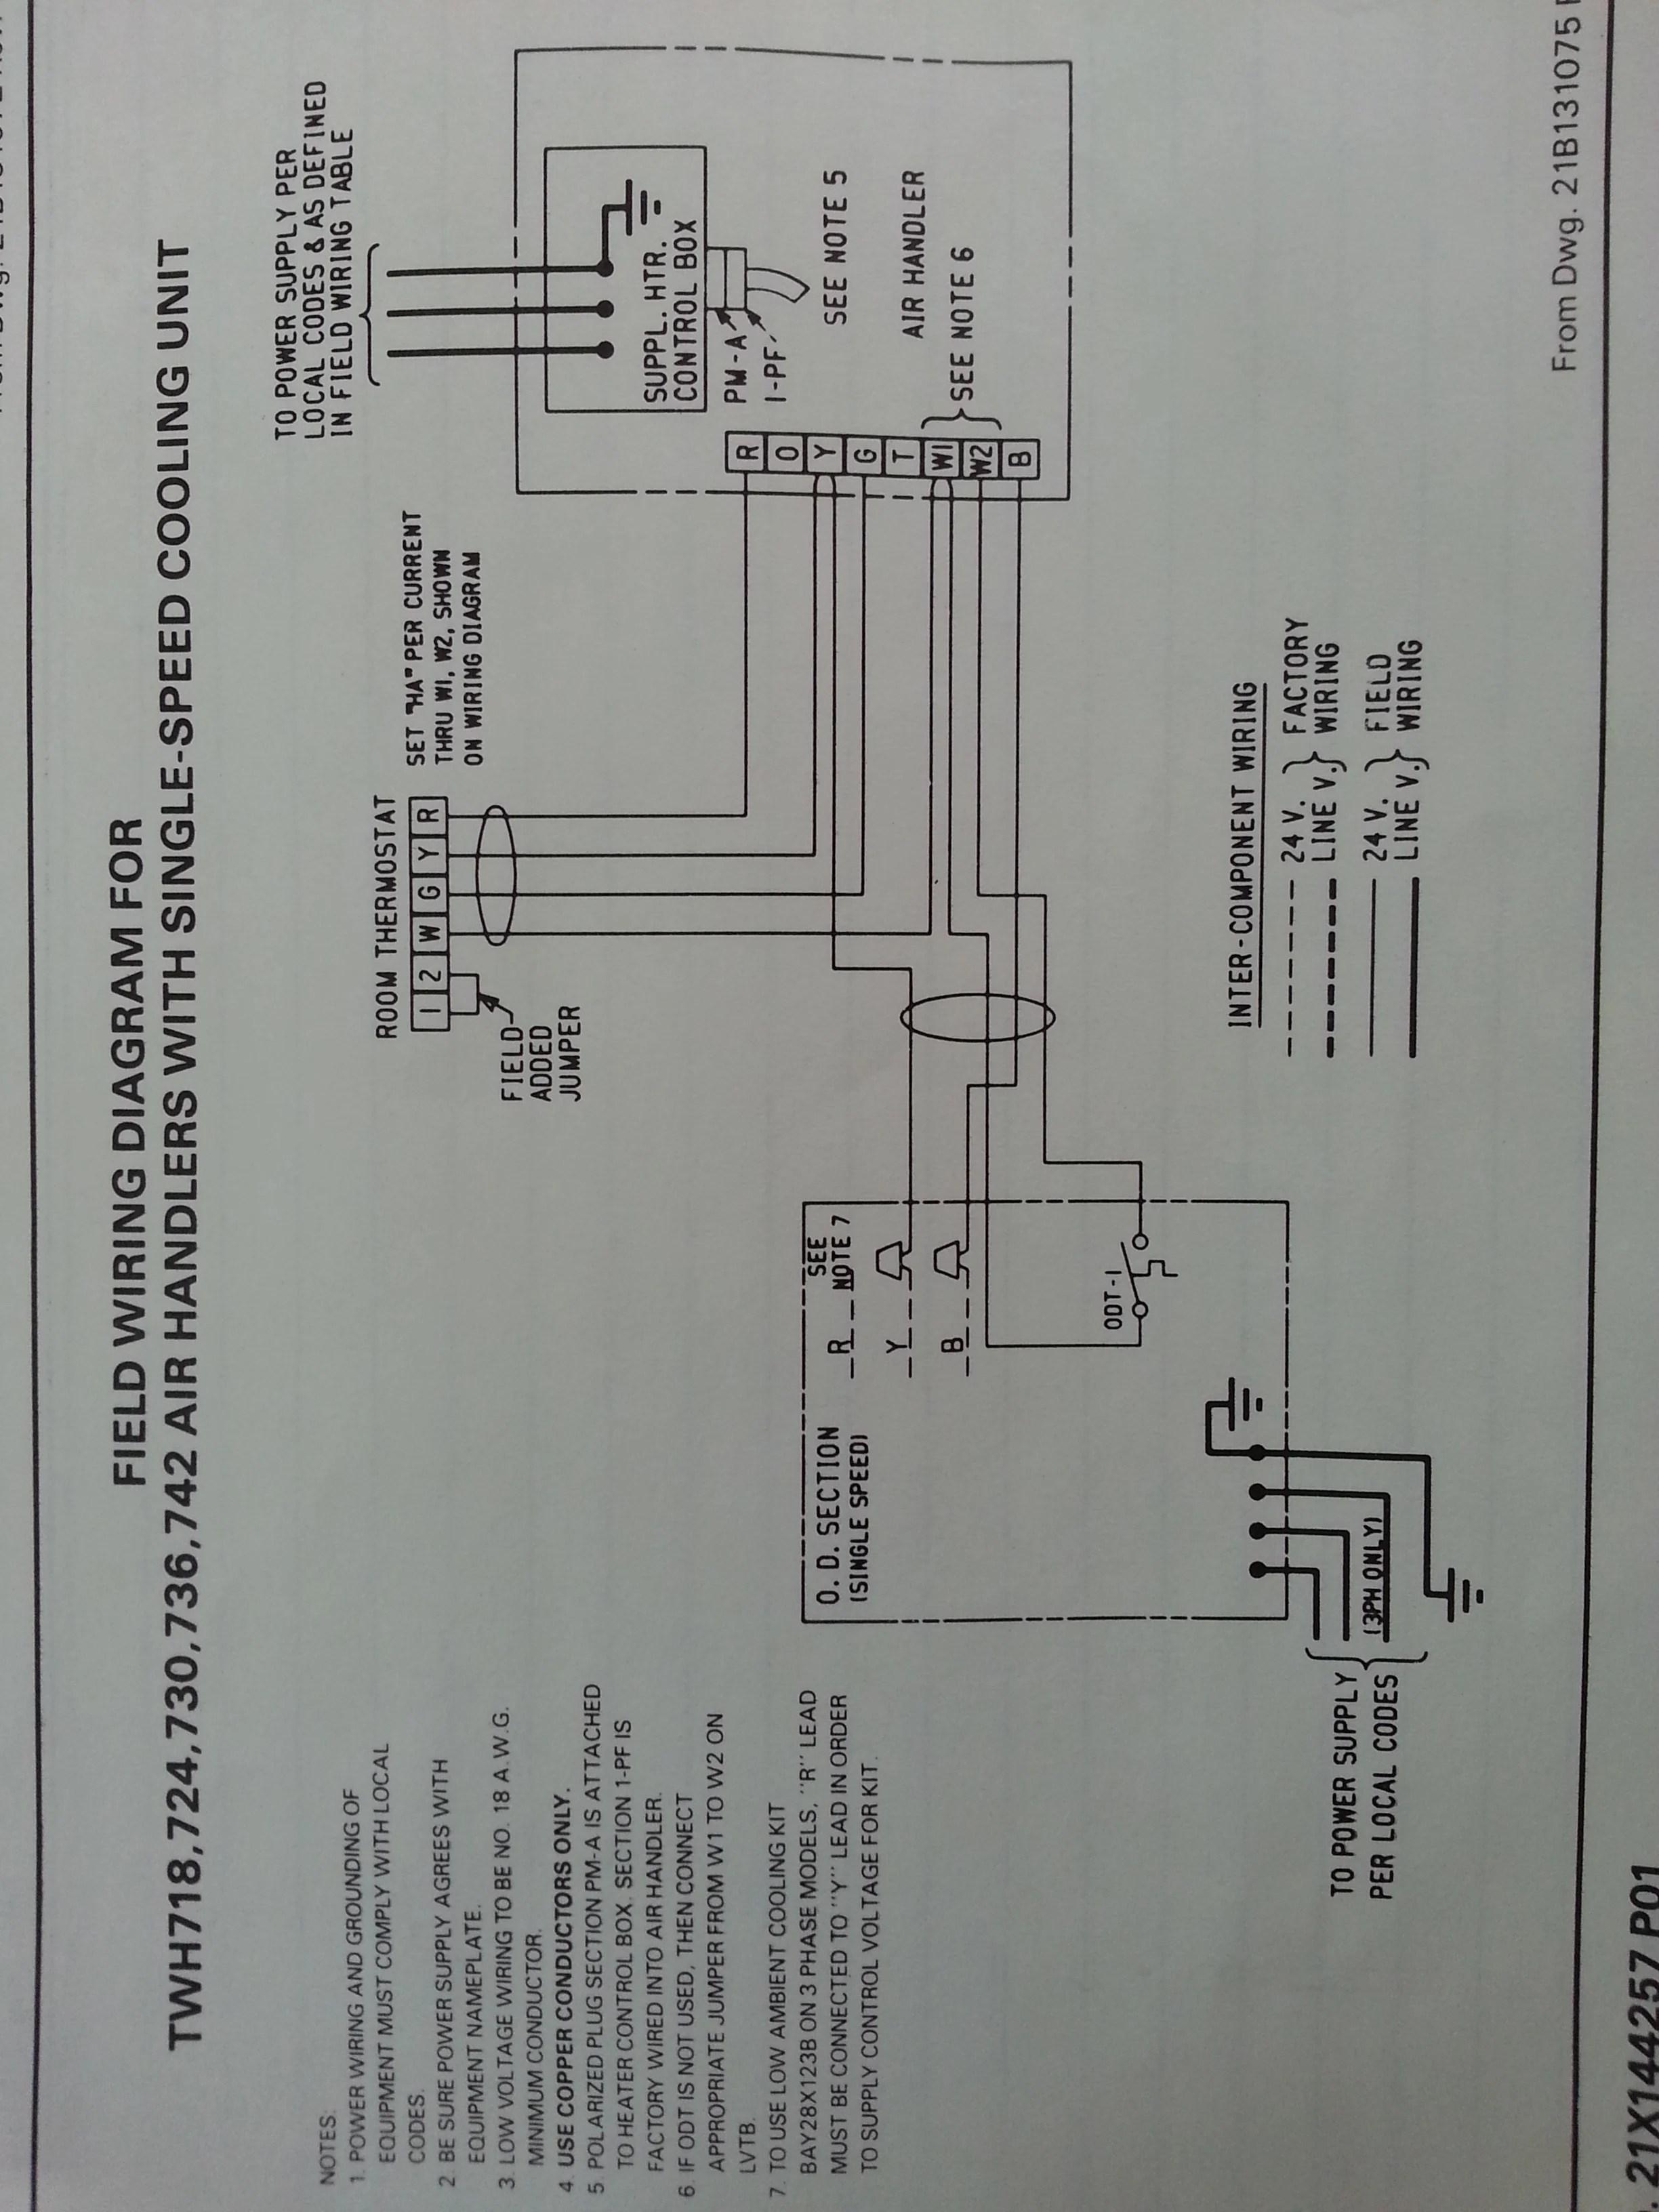 Trane Heat Pump Wiring Diagram : trane, wiring, diagram, Trane, XL1200, Repair, Heating, Help: